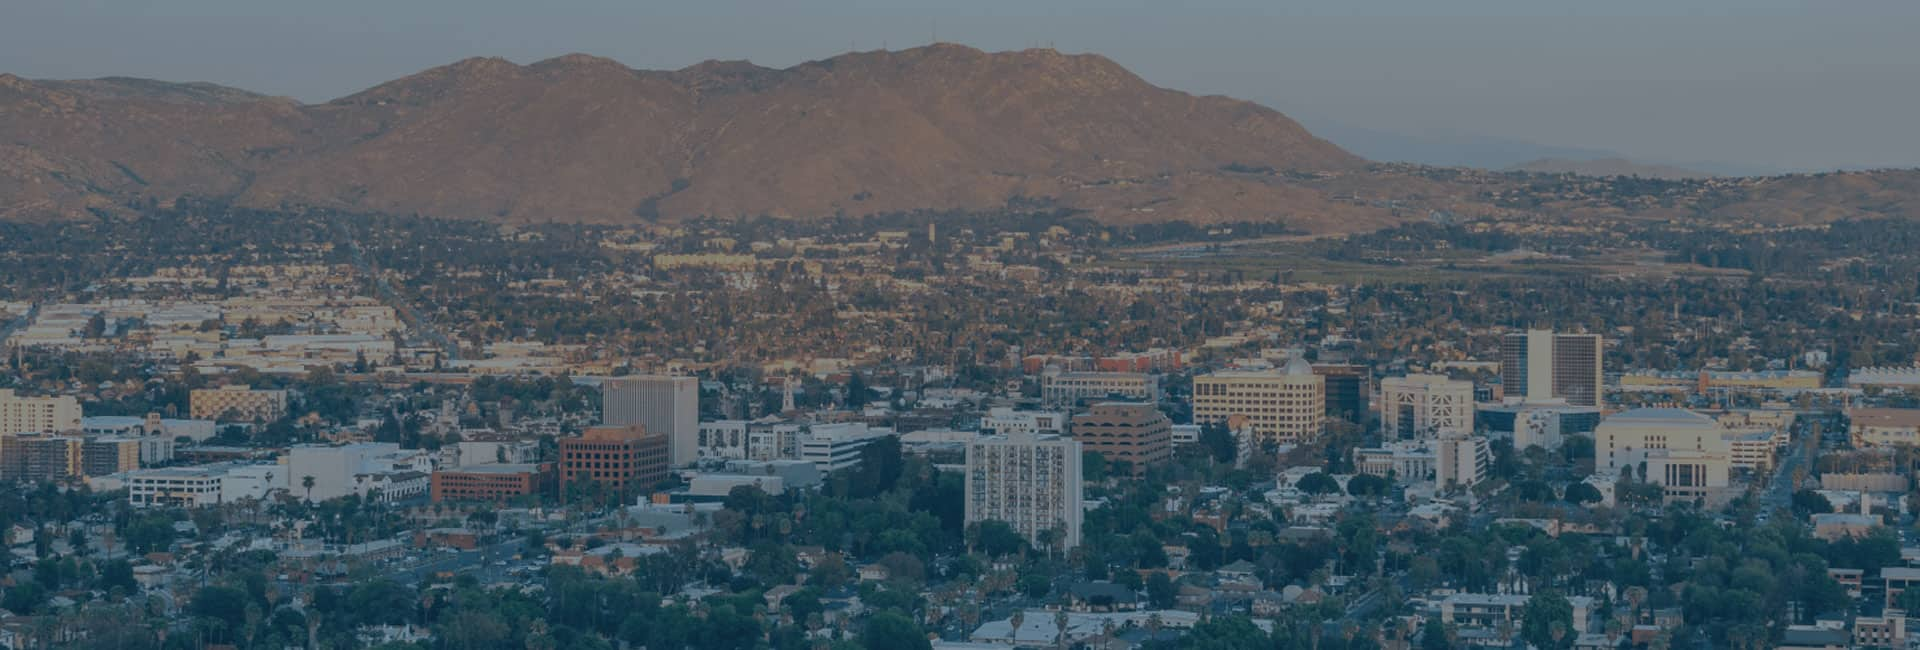 City of Riverside, California